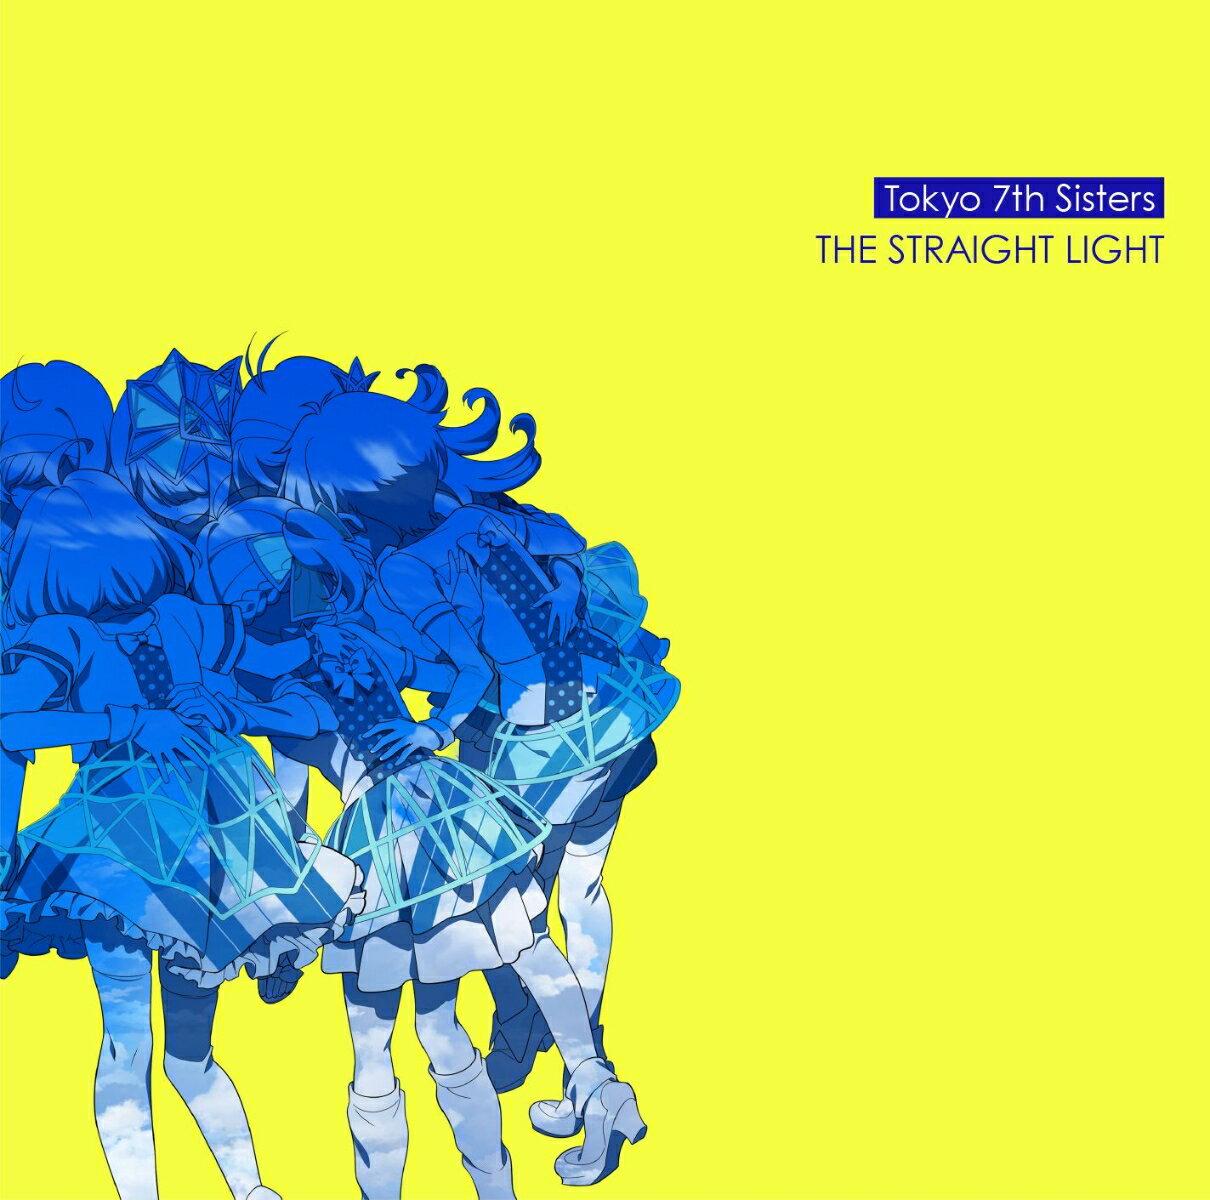 CD, ゲームミュージック THE STRAIGHT LIGHT ( 2CD) Tokyo 7th